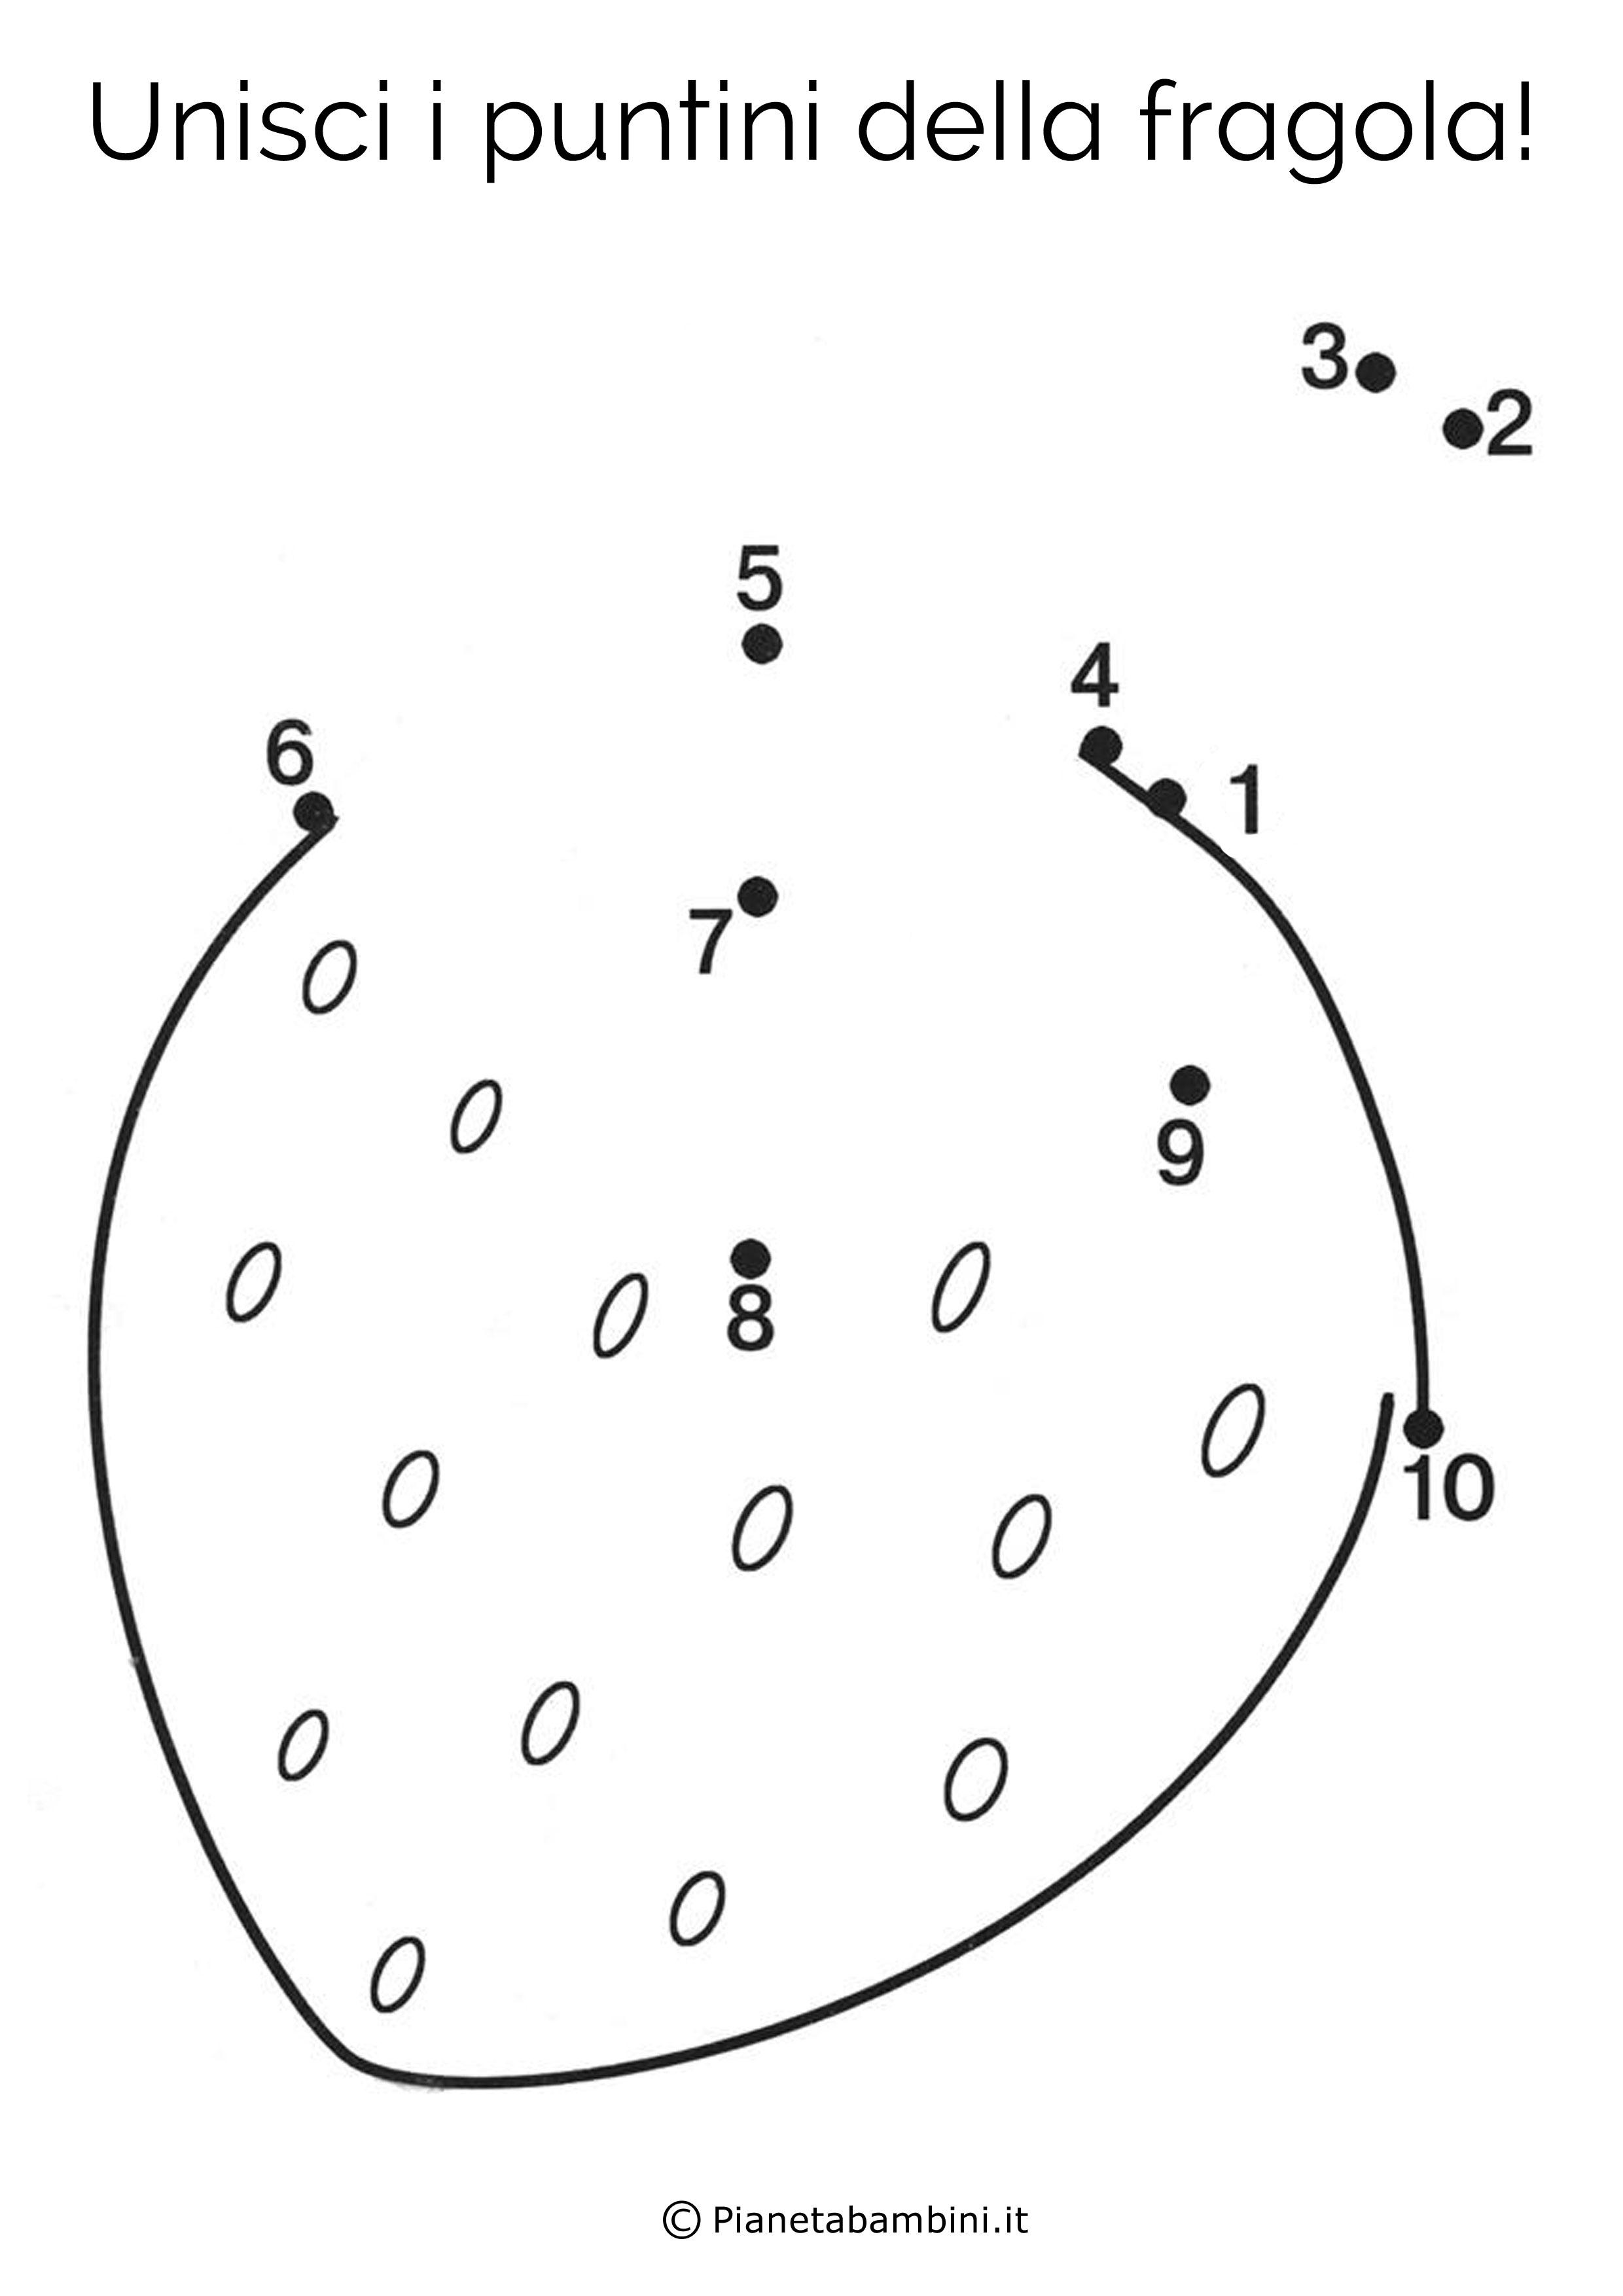 Disegno unisci i puntini fragola